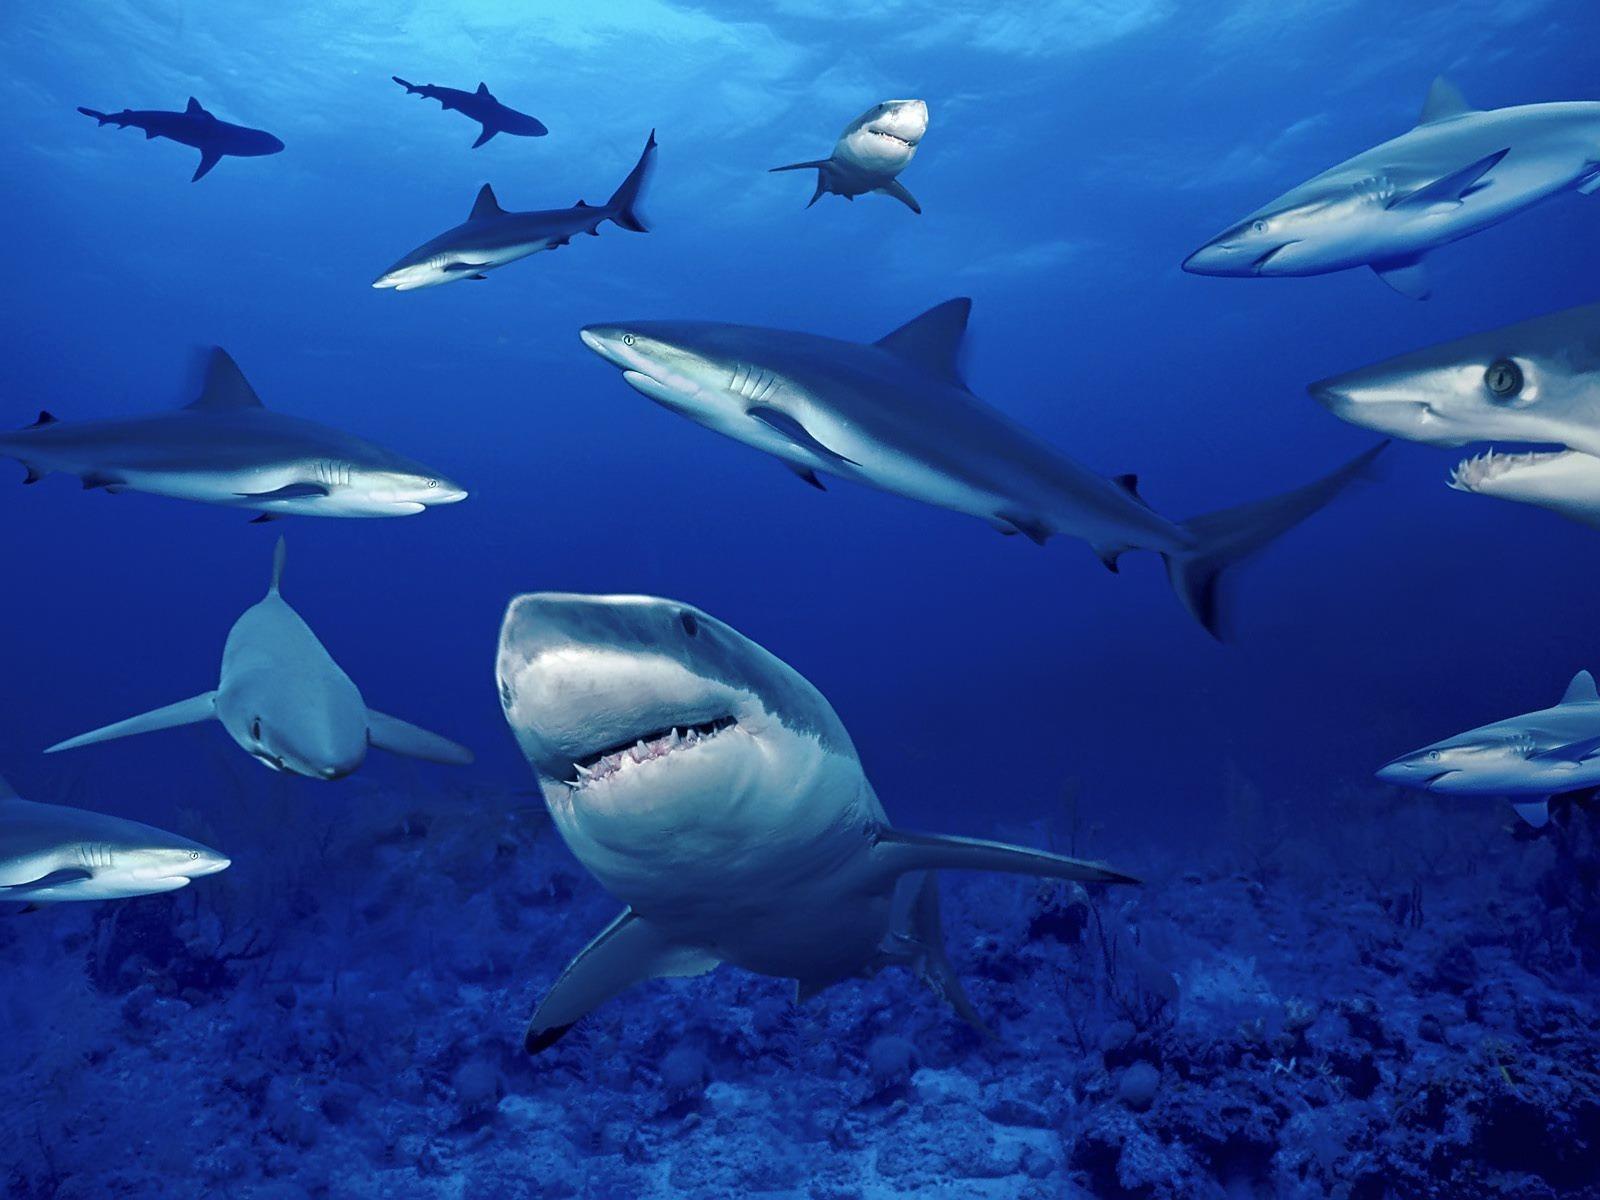 Marine Life - Sea Life Wallpaper (7591175) - Fanpop